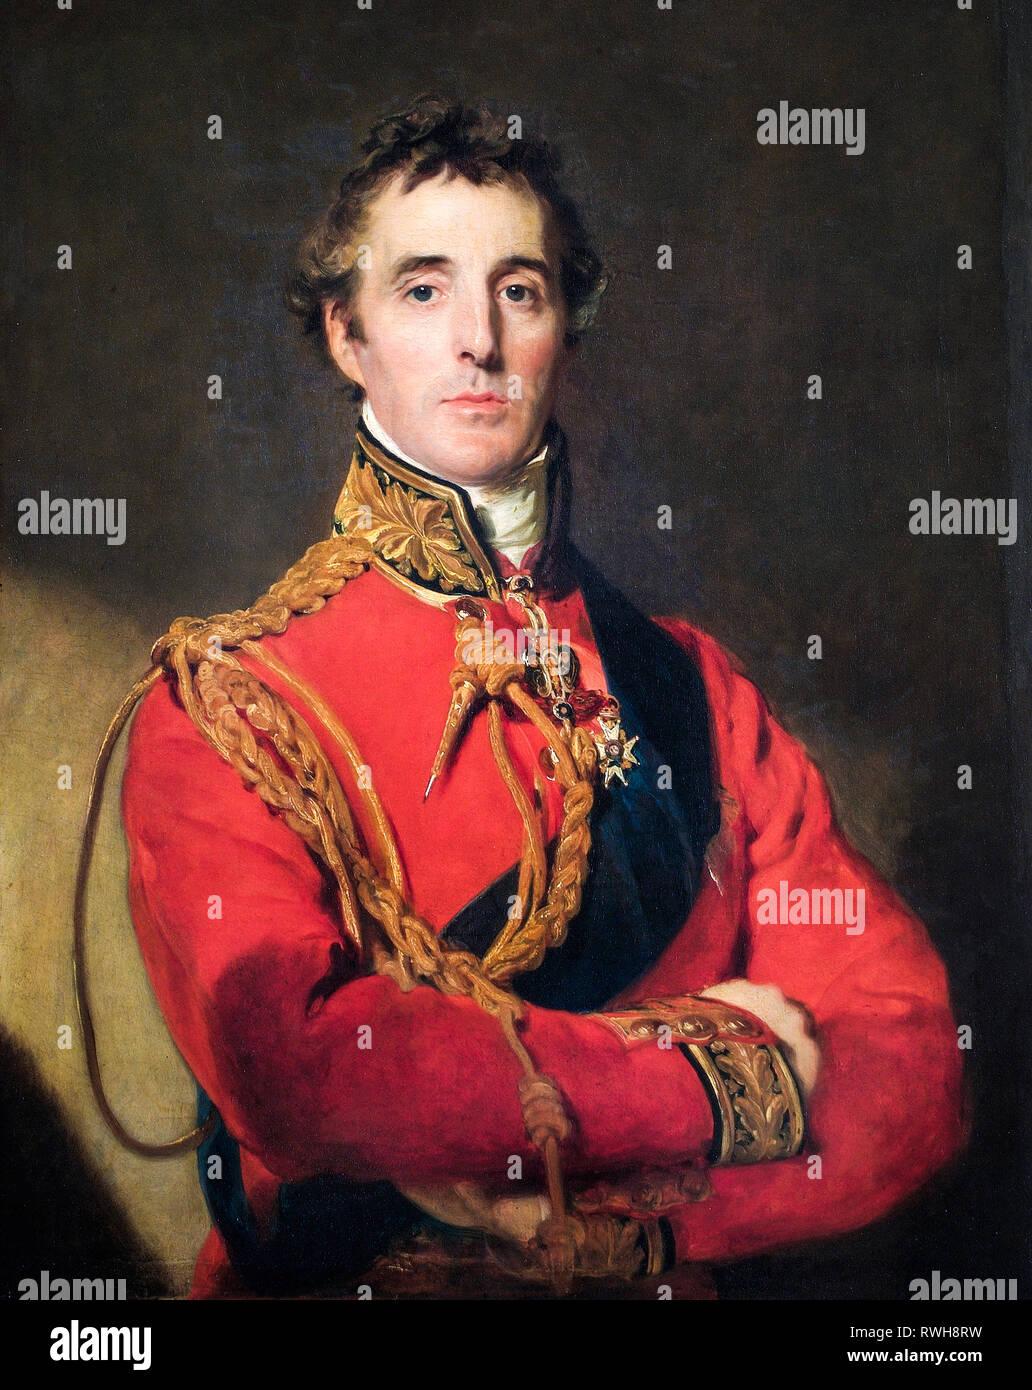 Arthur Wellesley, primer duque de Wellington (1769-1852), retrato de Thomas Lawrence, c. 1815-1816 Foto de stock